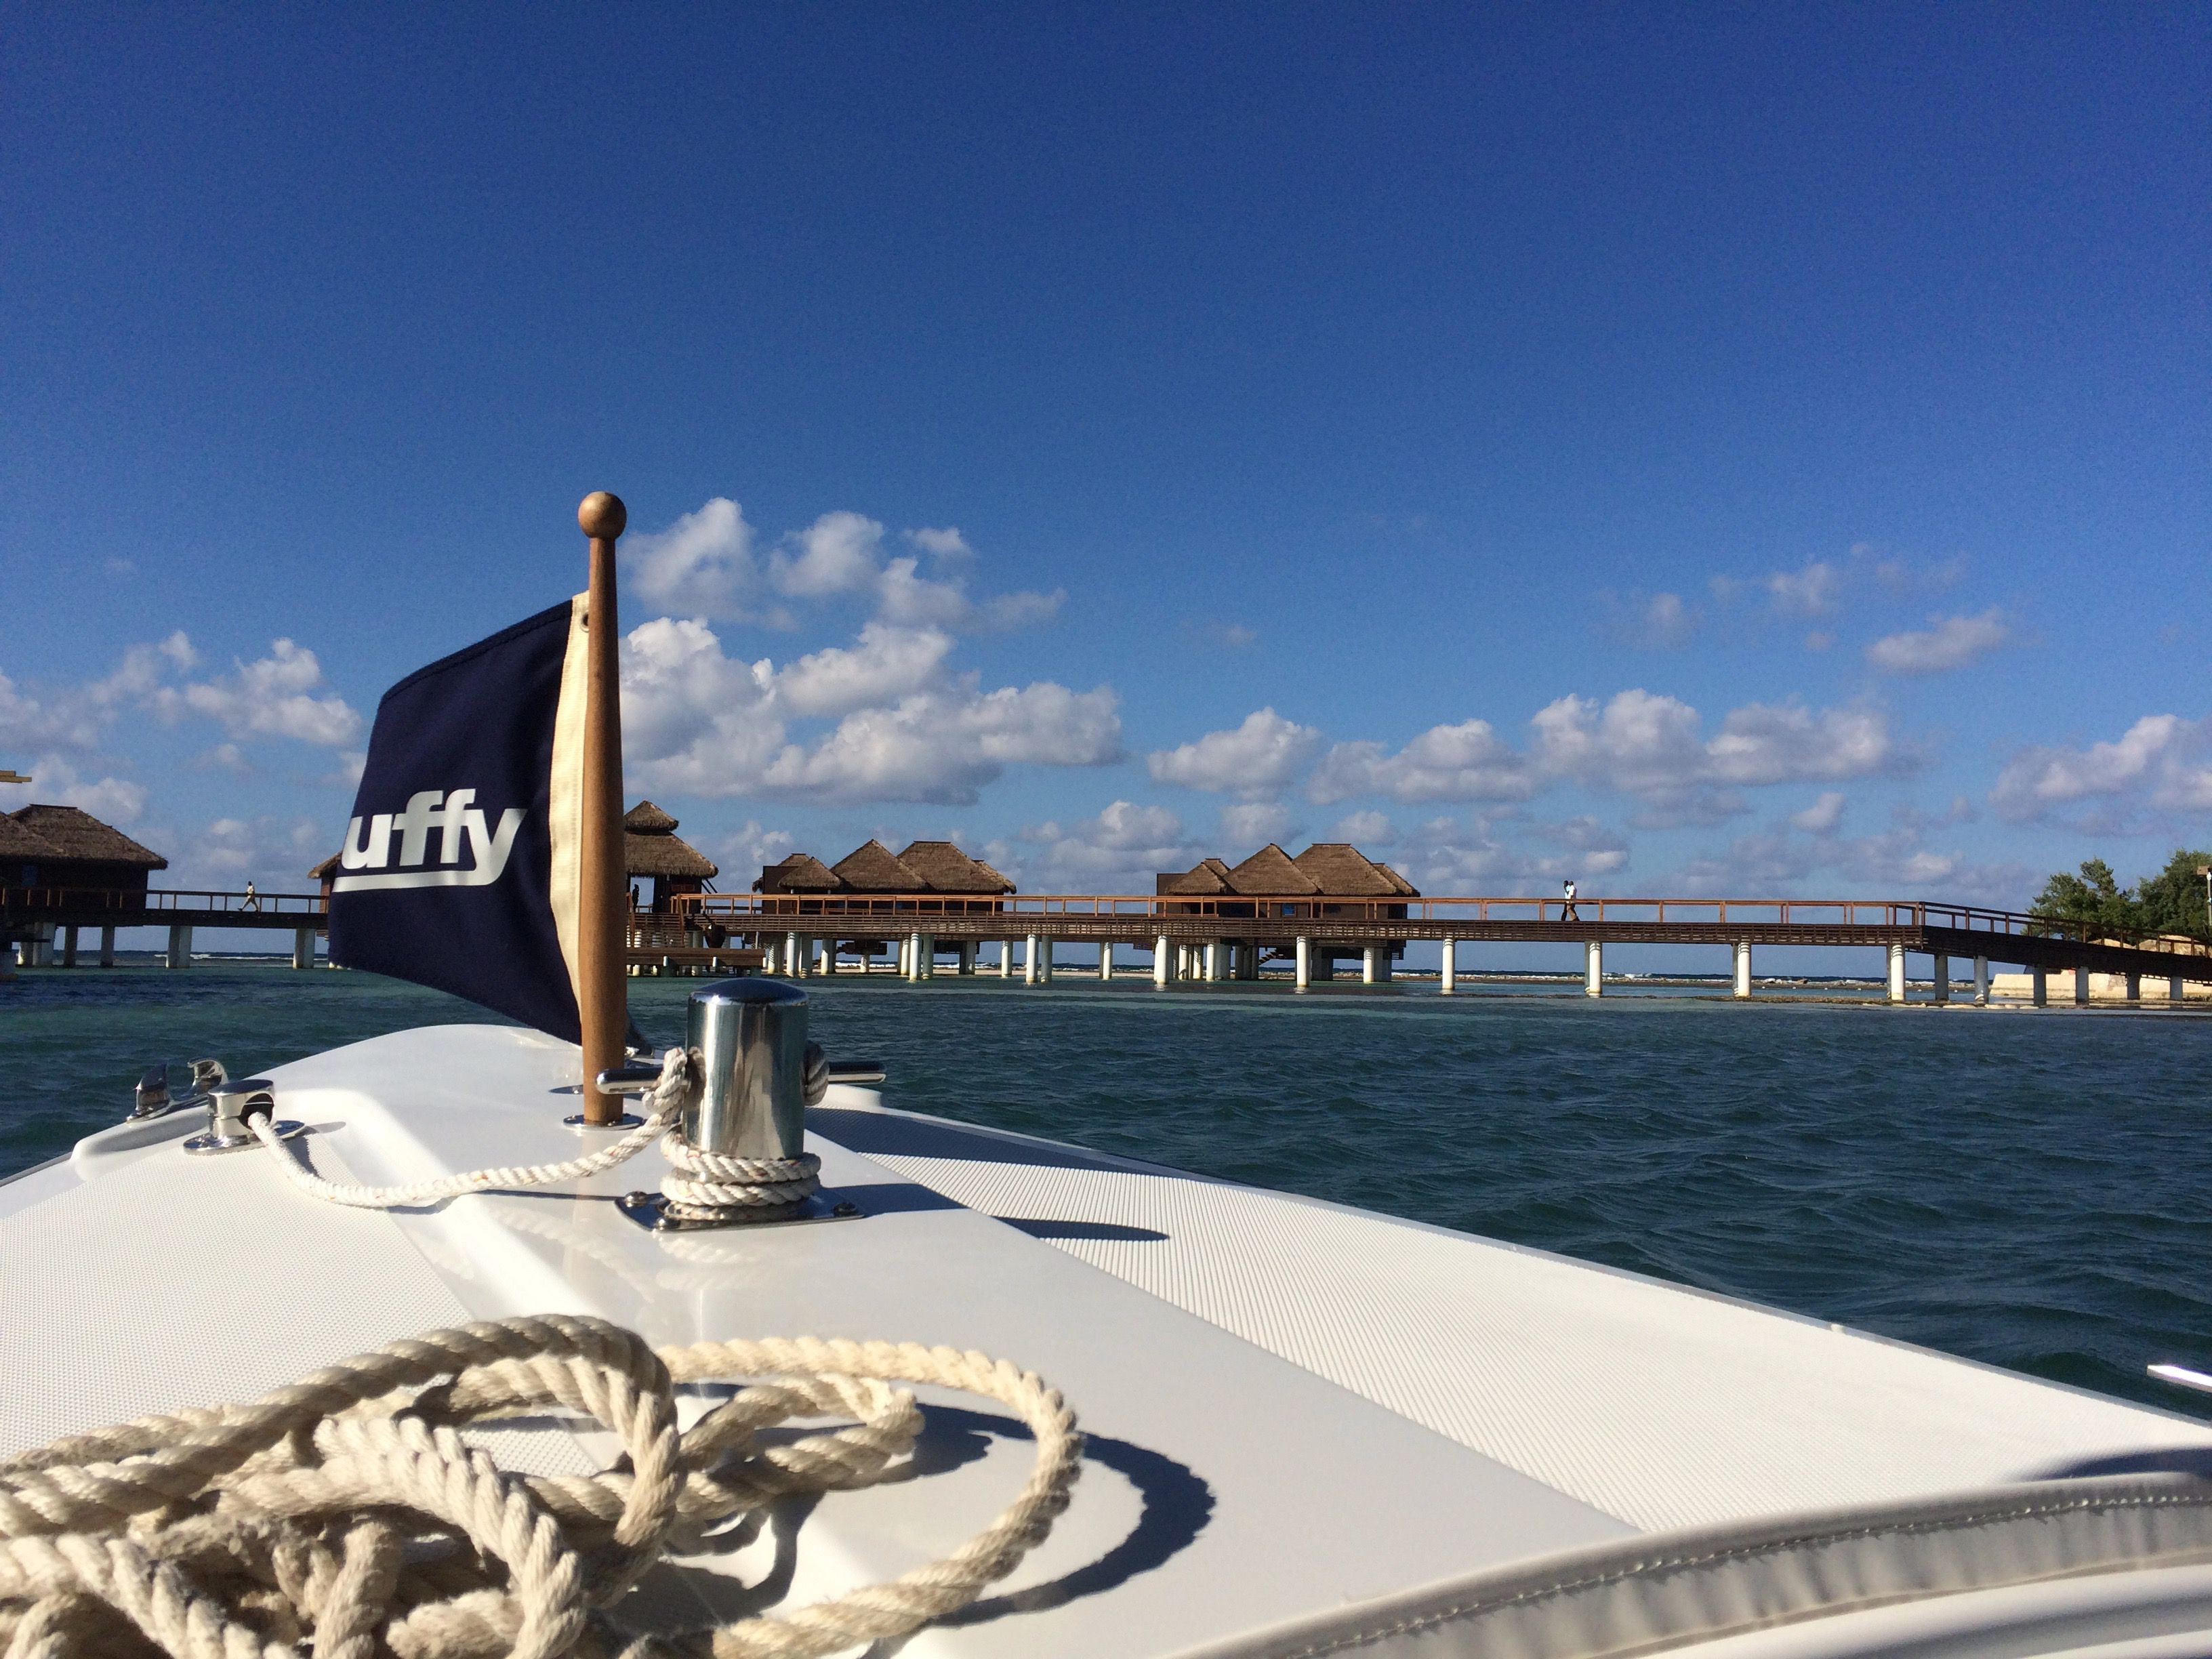 Boat to overwater villas